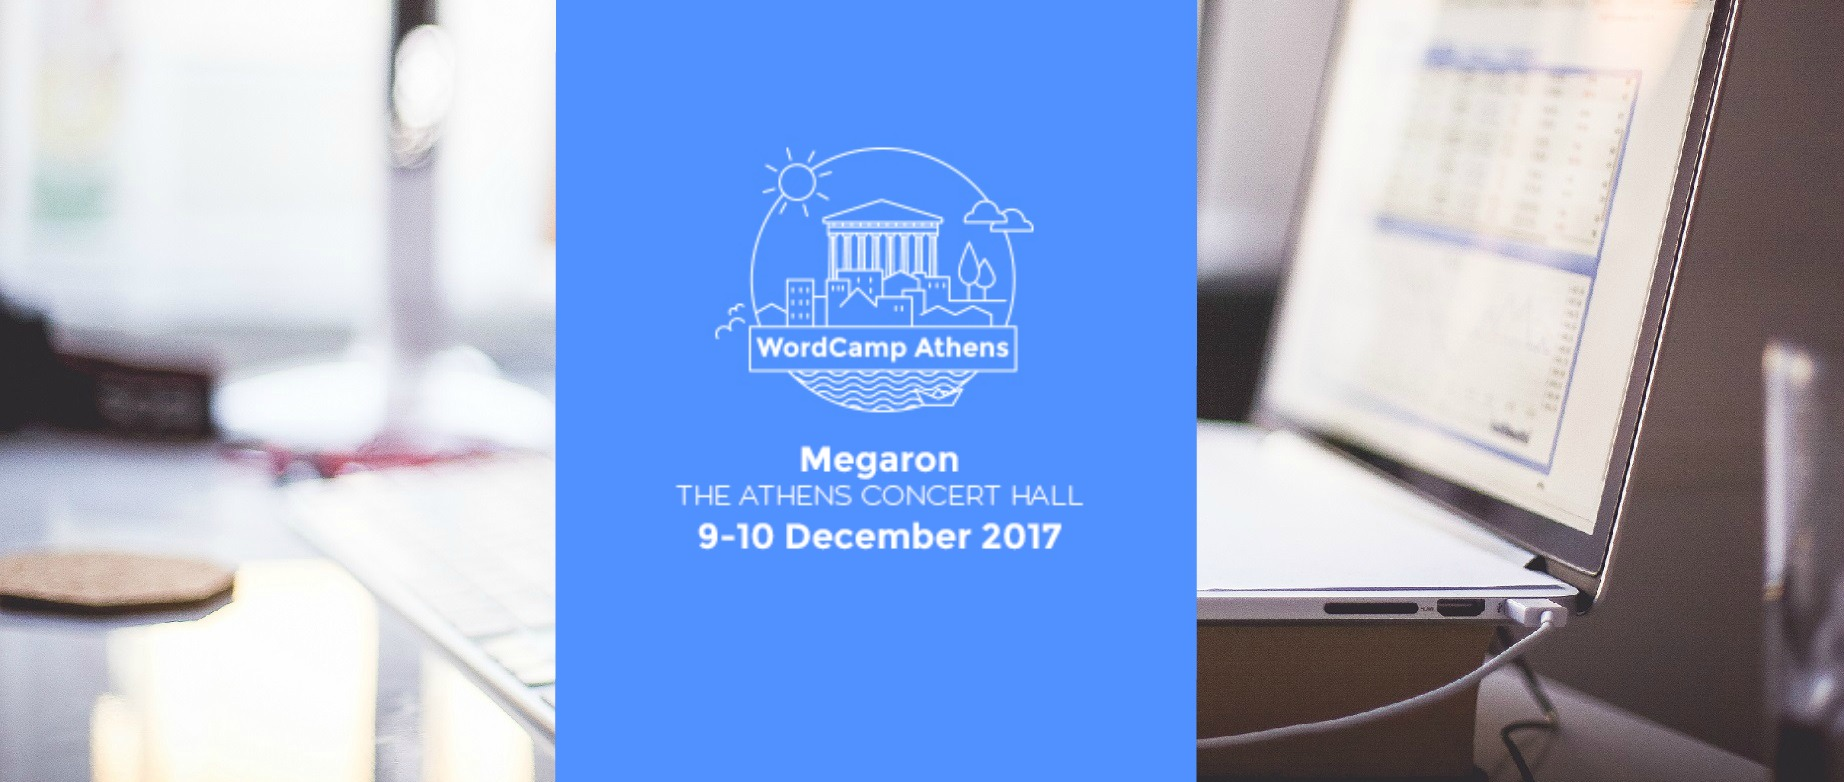 WordCamp Athens 2017